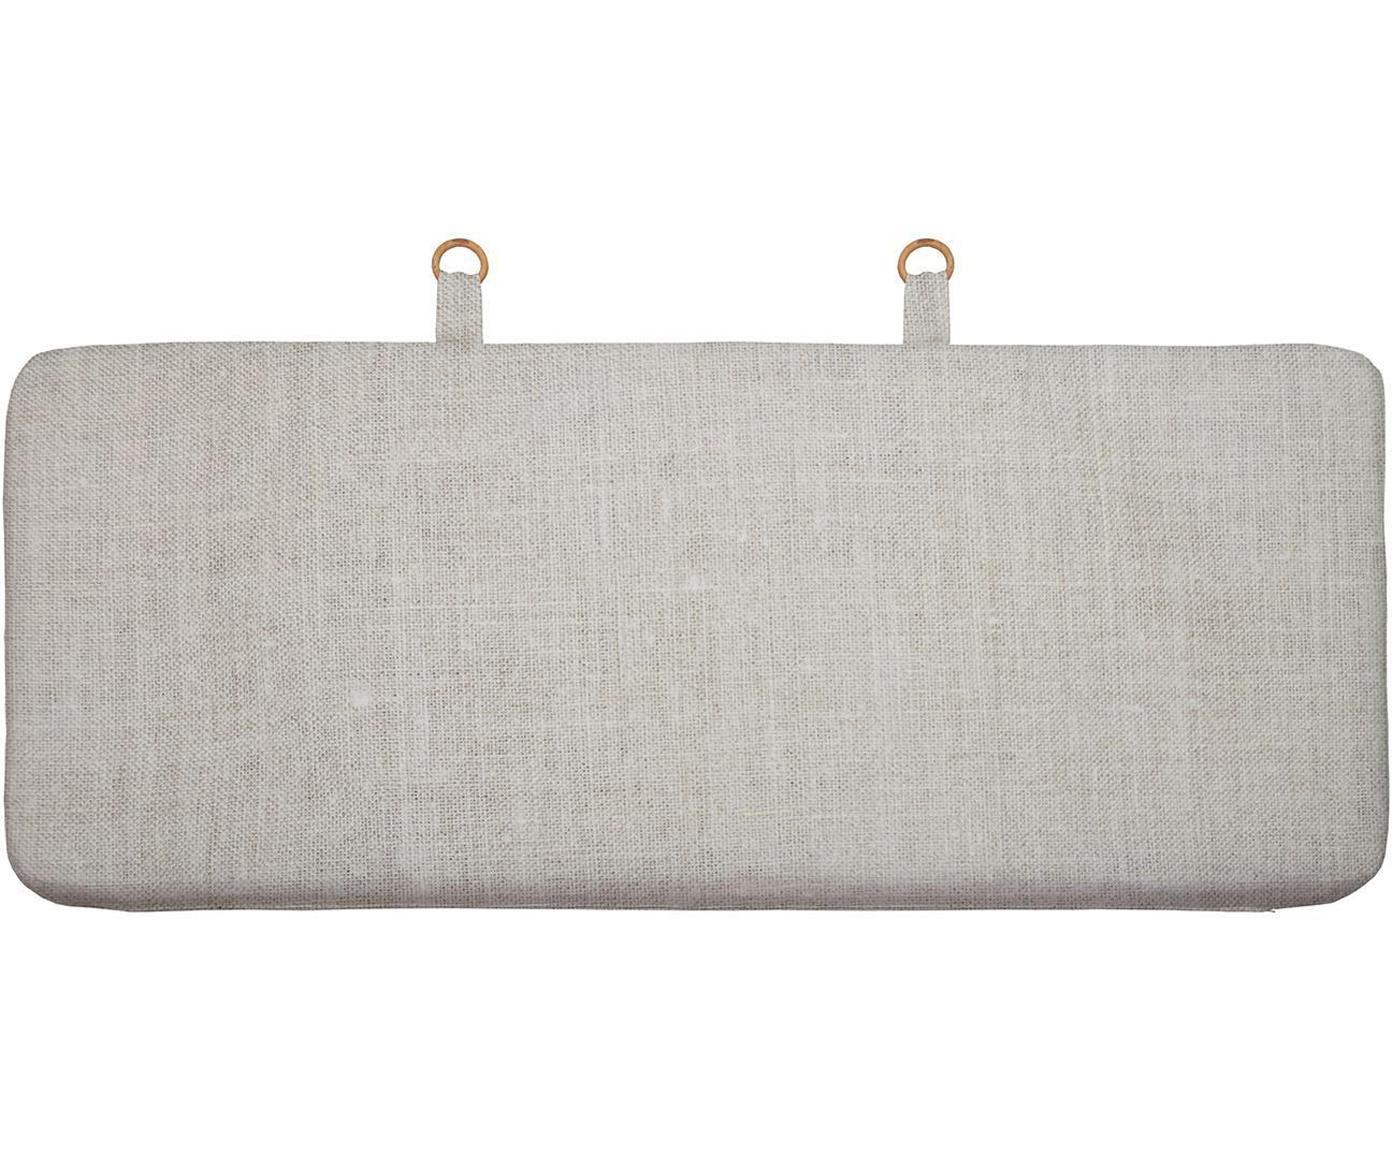 Cabecero Basic, Tapizado: lino, poliéster, Beige, An 155 x Al 65 cm